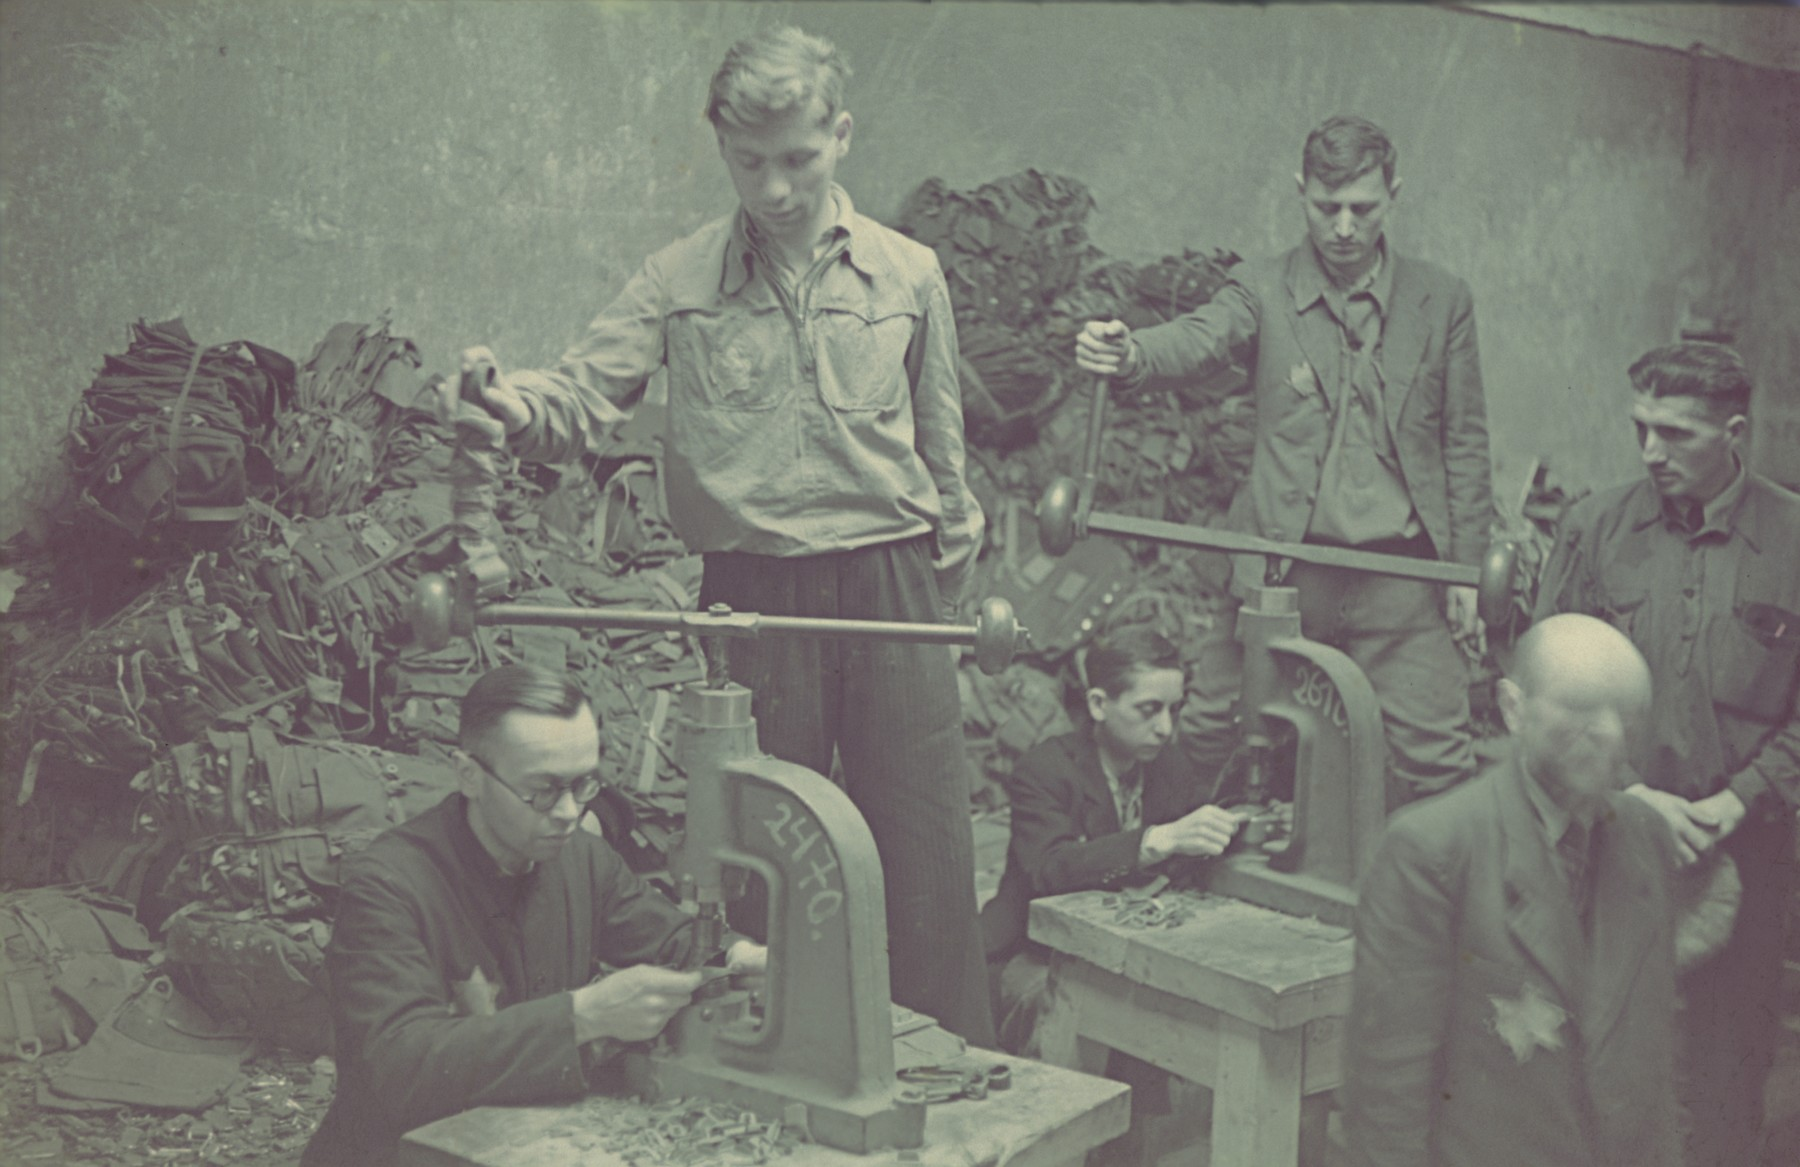 "Workers fashion metal fasteners in the saddle making workshop of the Lodz ghetto.  Original German caption: ""Getto-Litzmannstadt, Sattlerei"" (saddlery), #189."